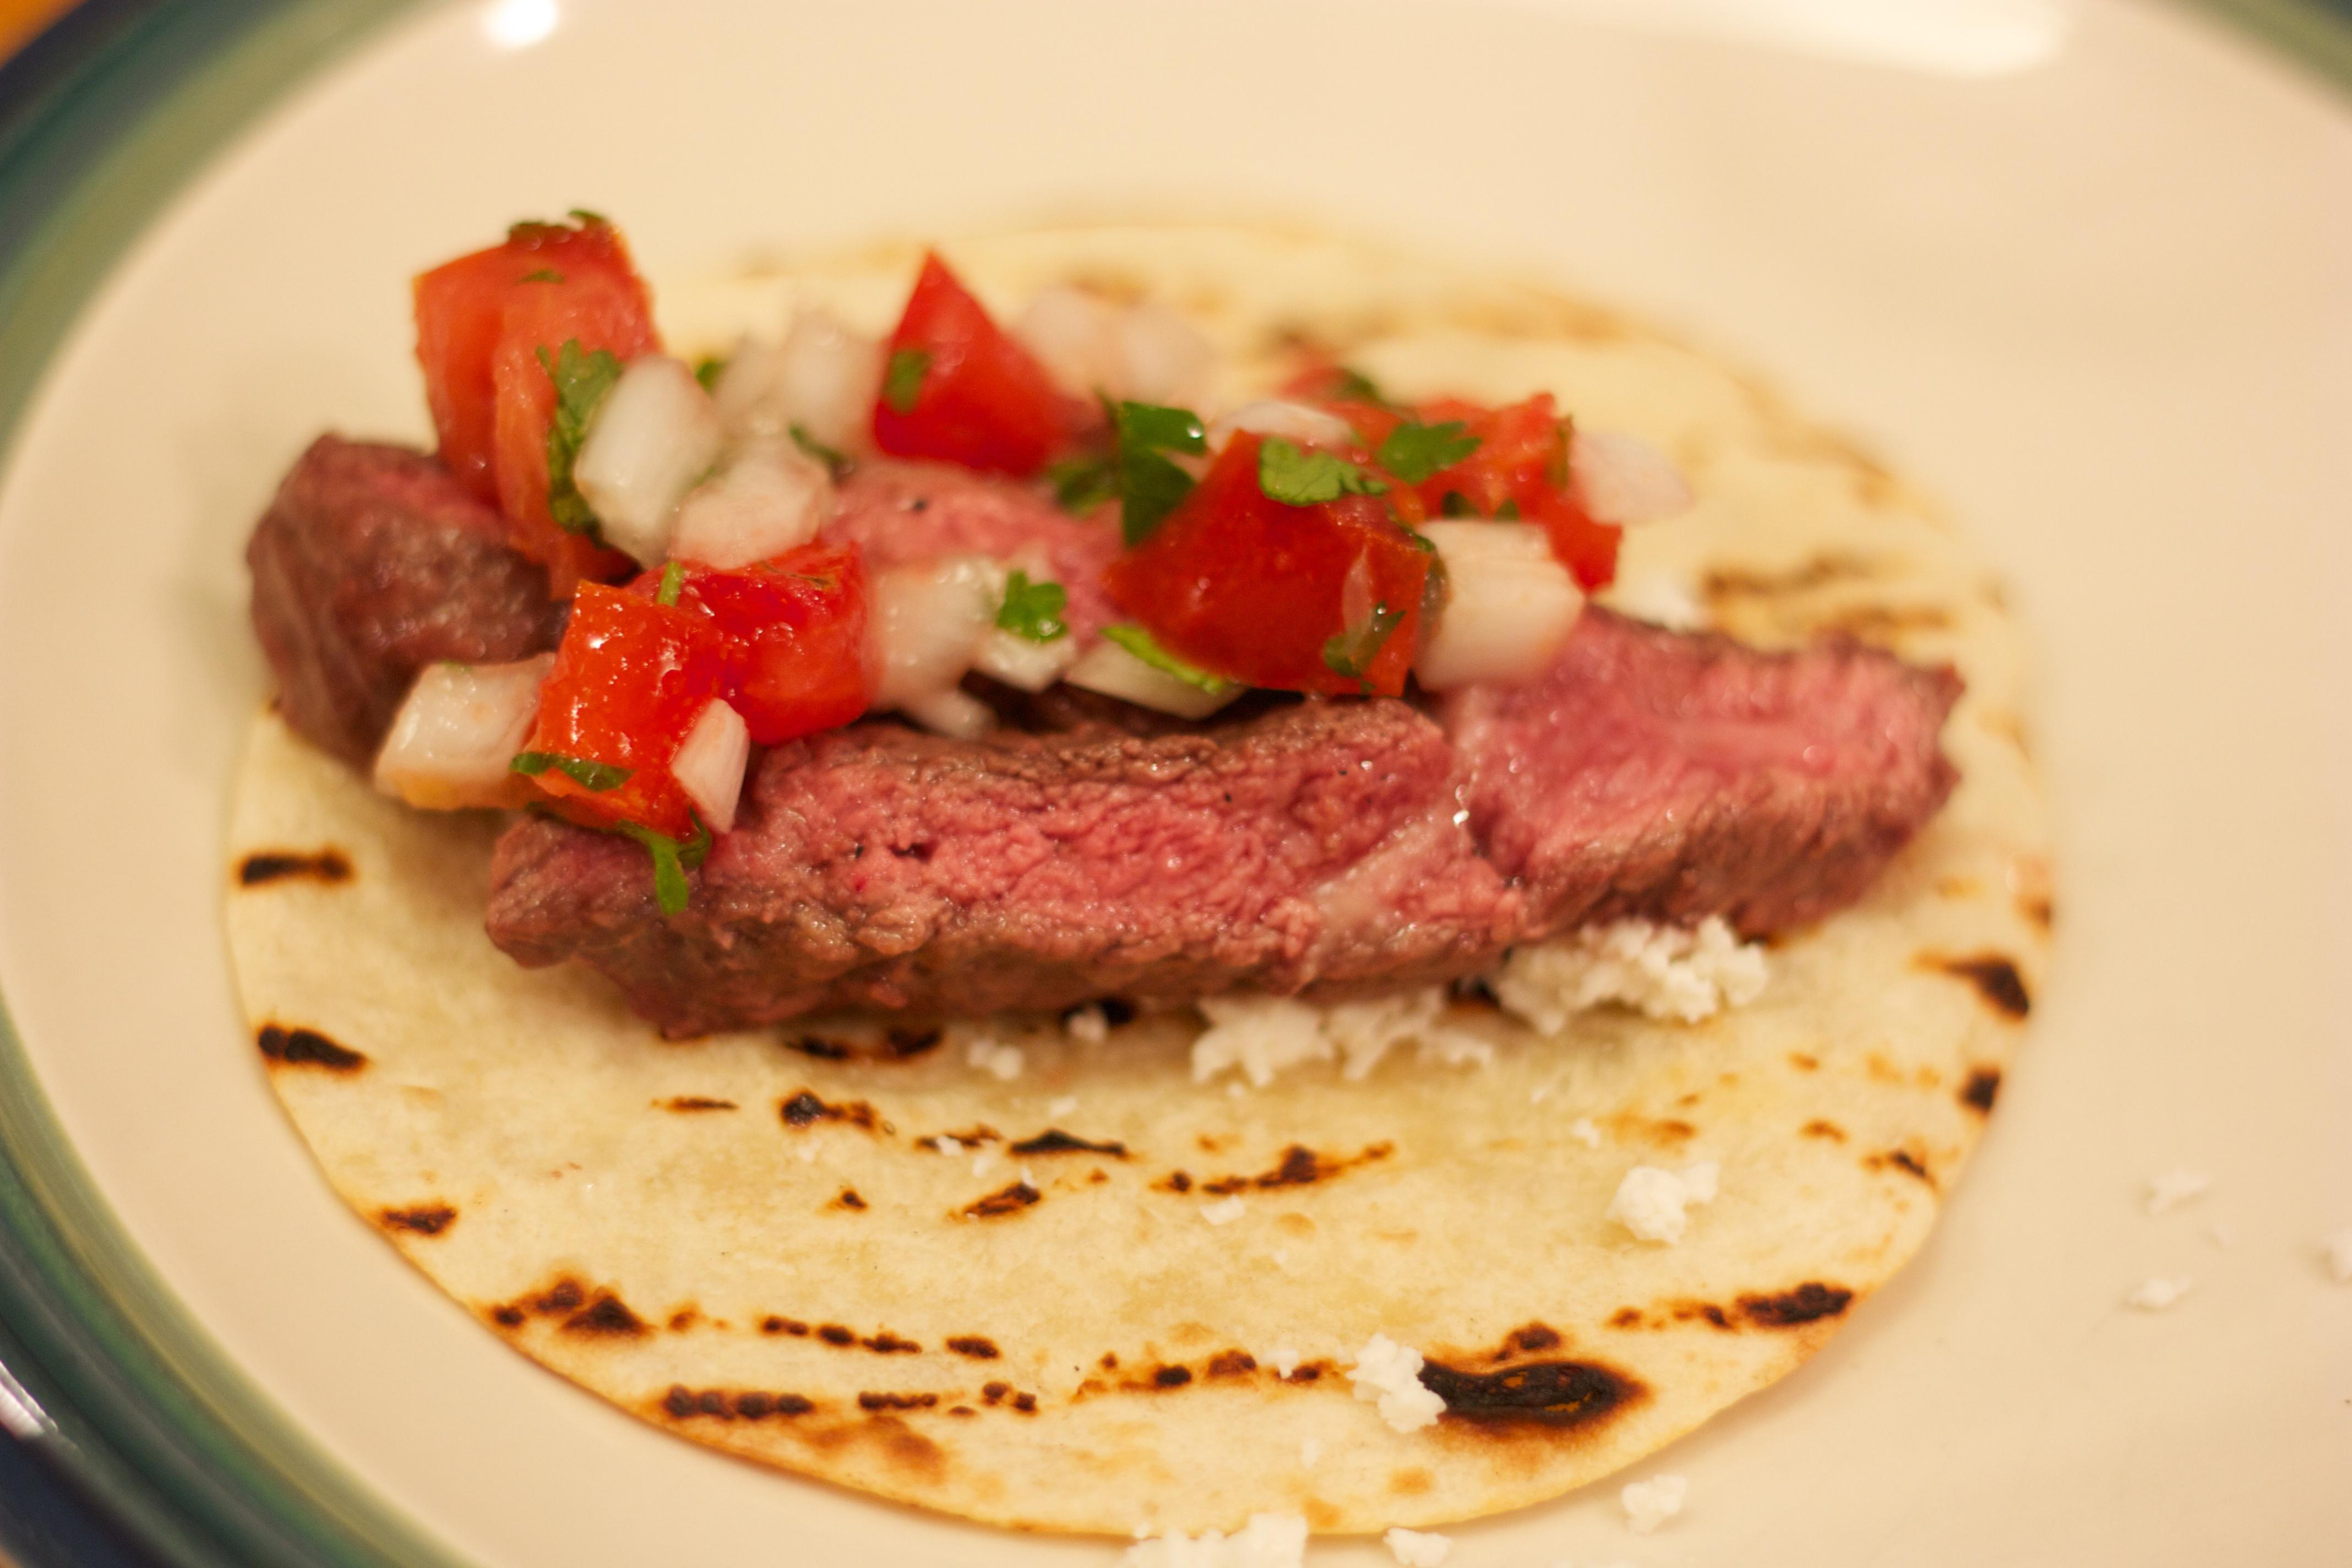 Saturday Dinner: Carne Asada Tacos (or Tacos Con Carne Asada)